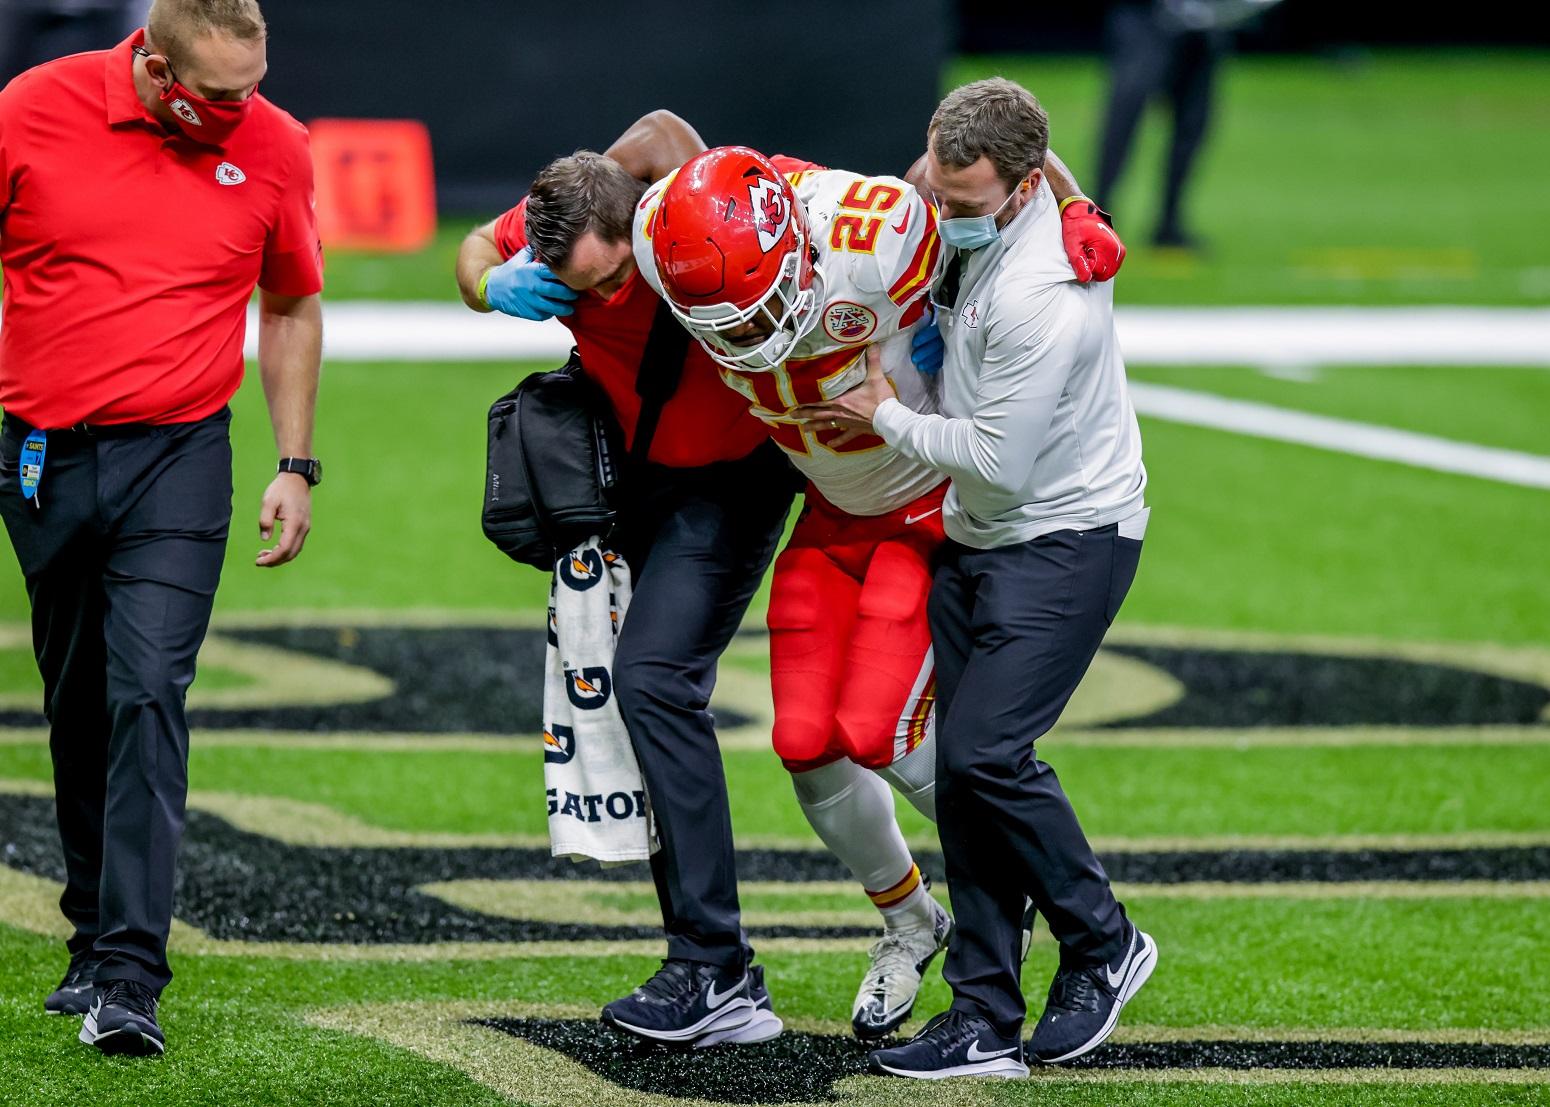 Kansas City Chiefs suffer huge loss damage Super Bowl hopes